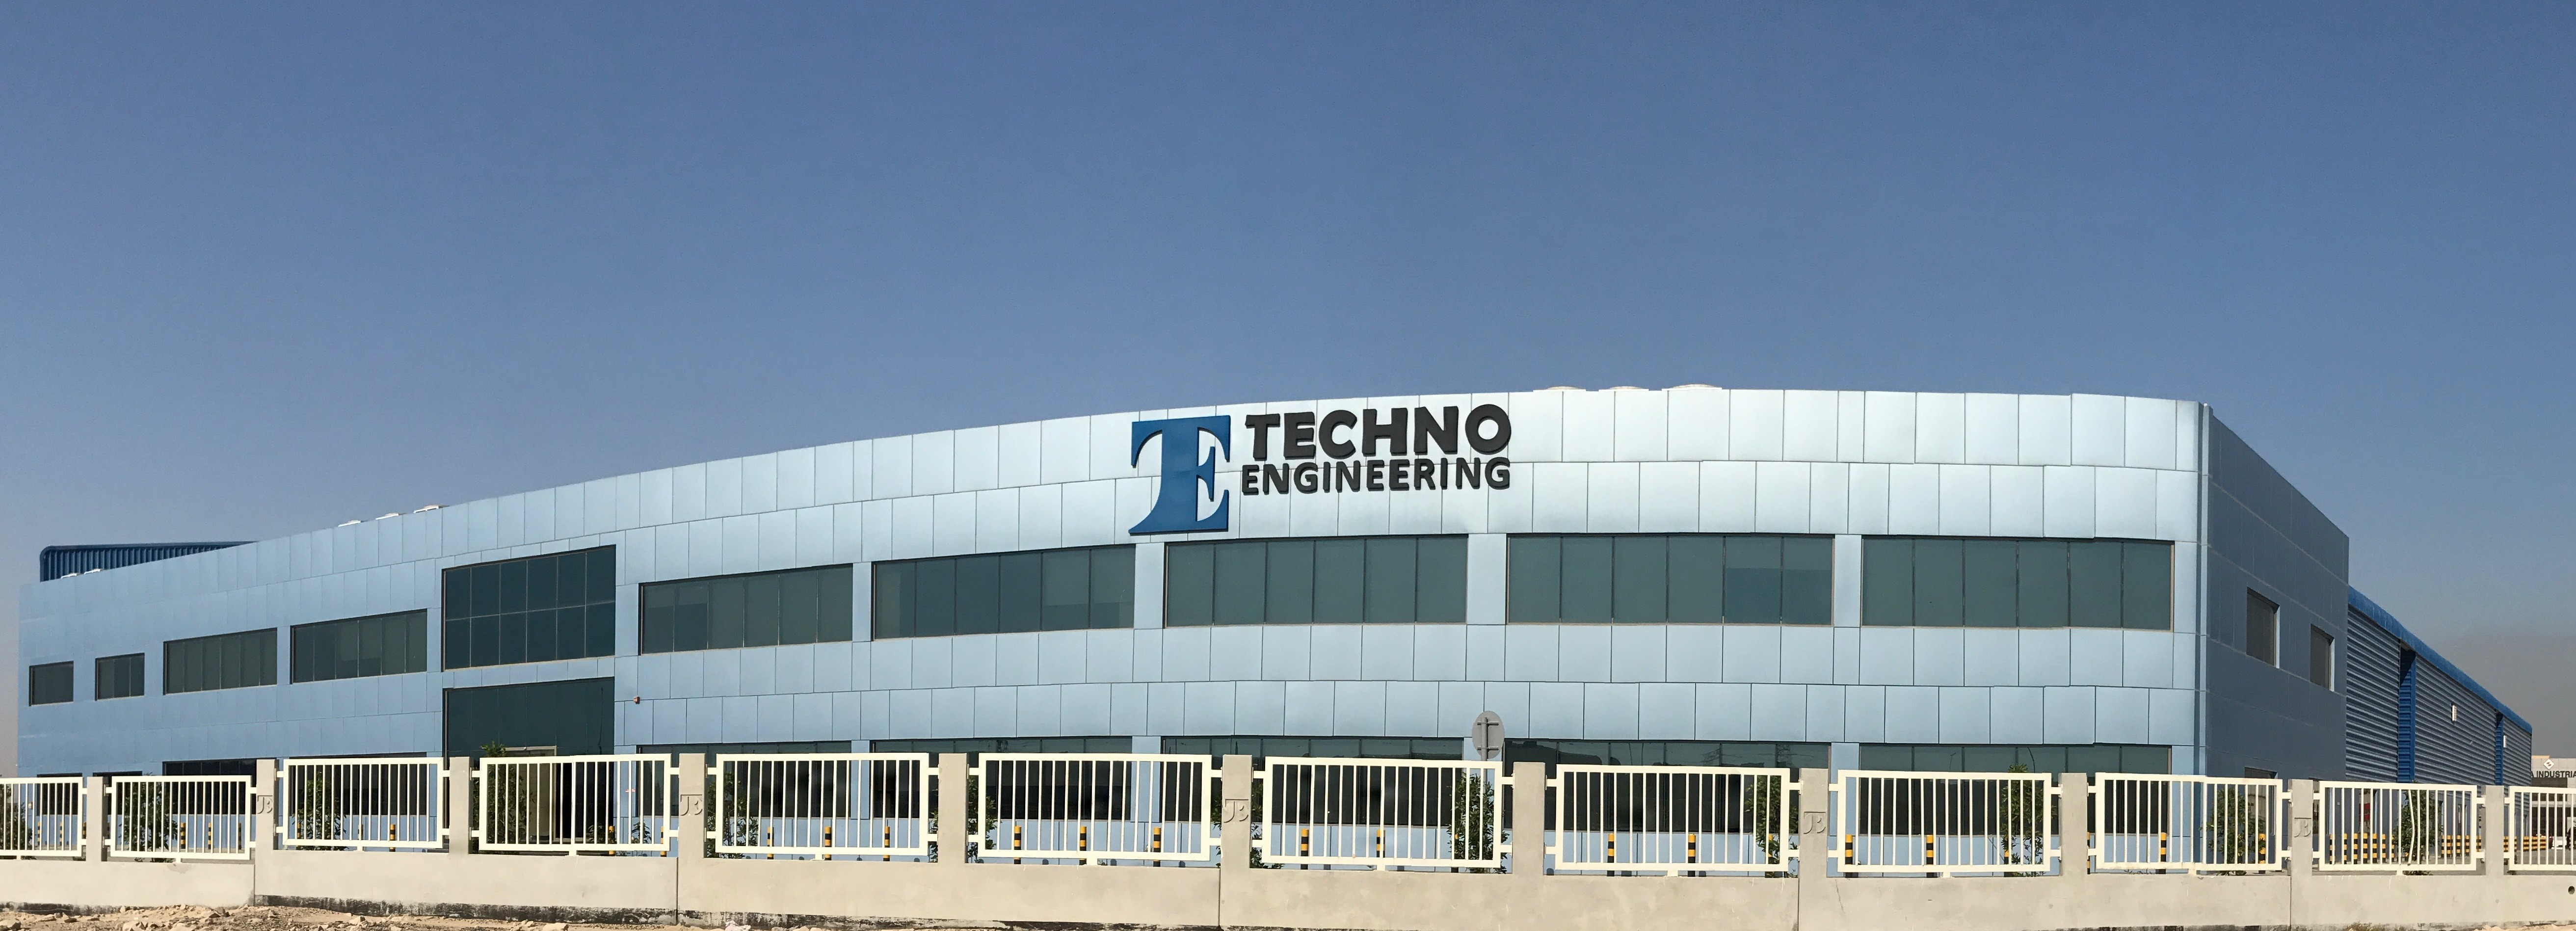 Techno Engineering Services Pvt Ltd | LinkedIn